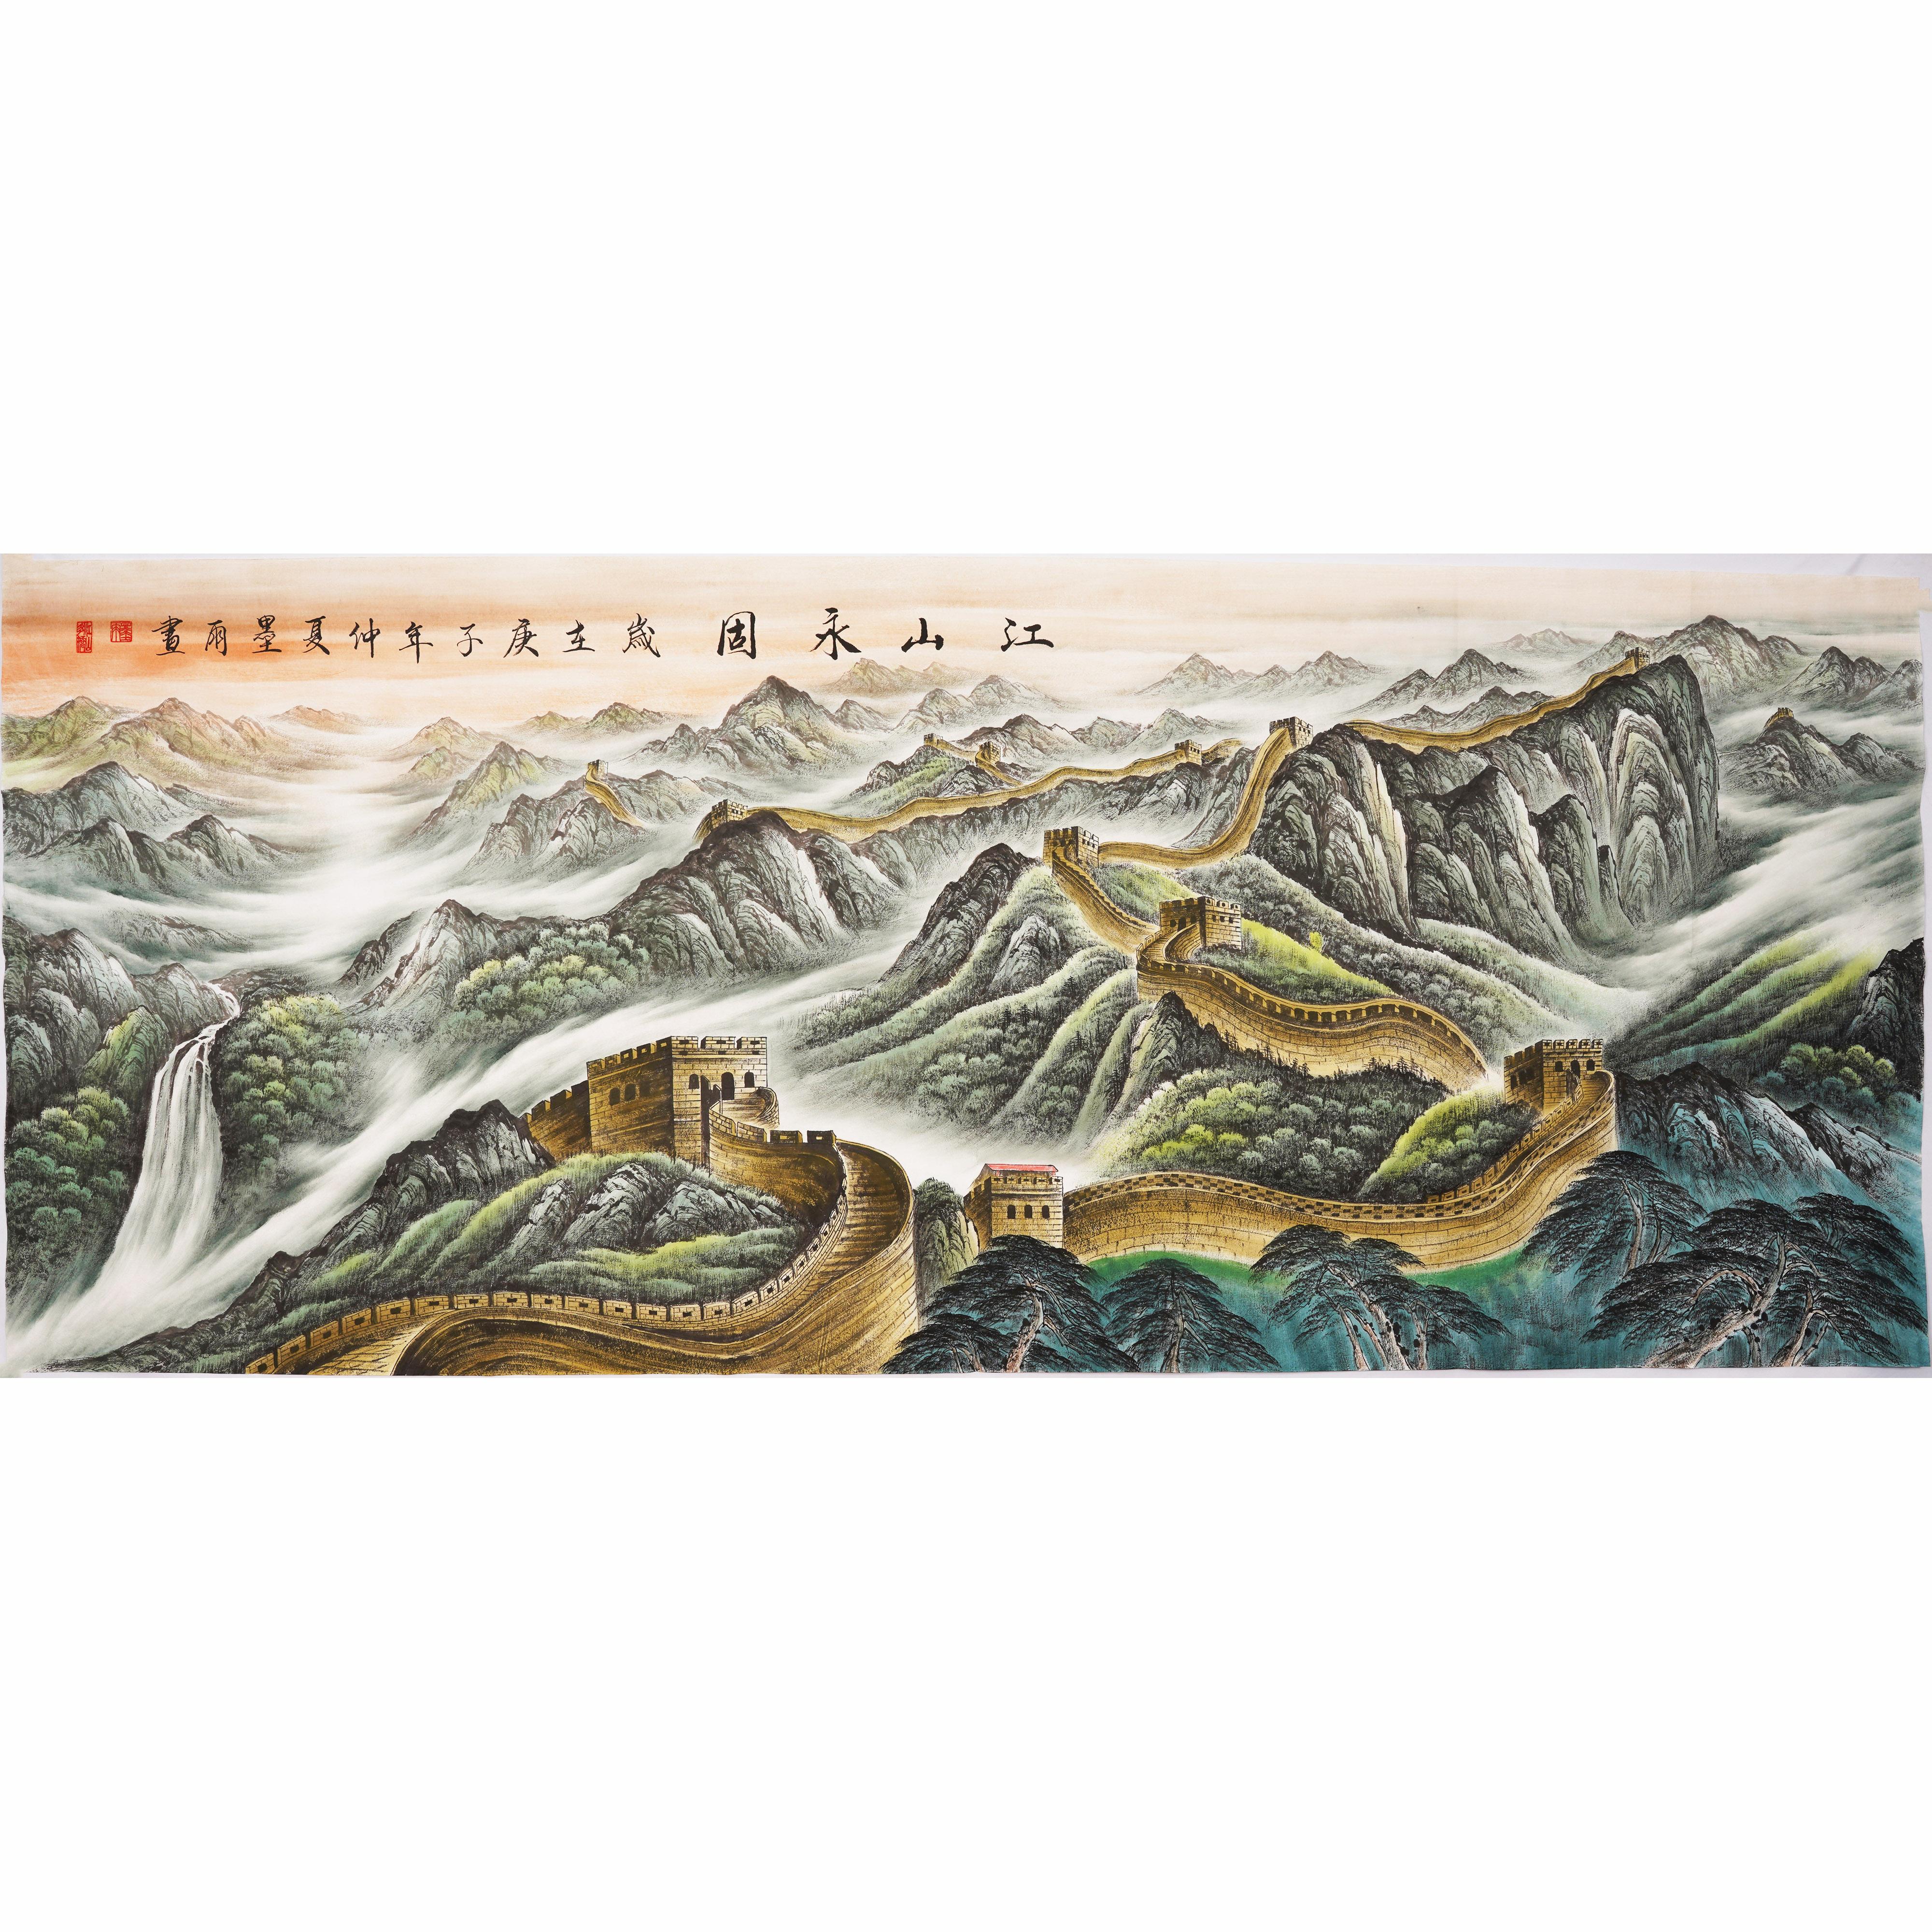 Китайская живопись Артикул 581058430455